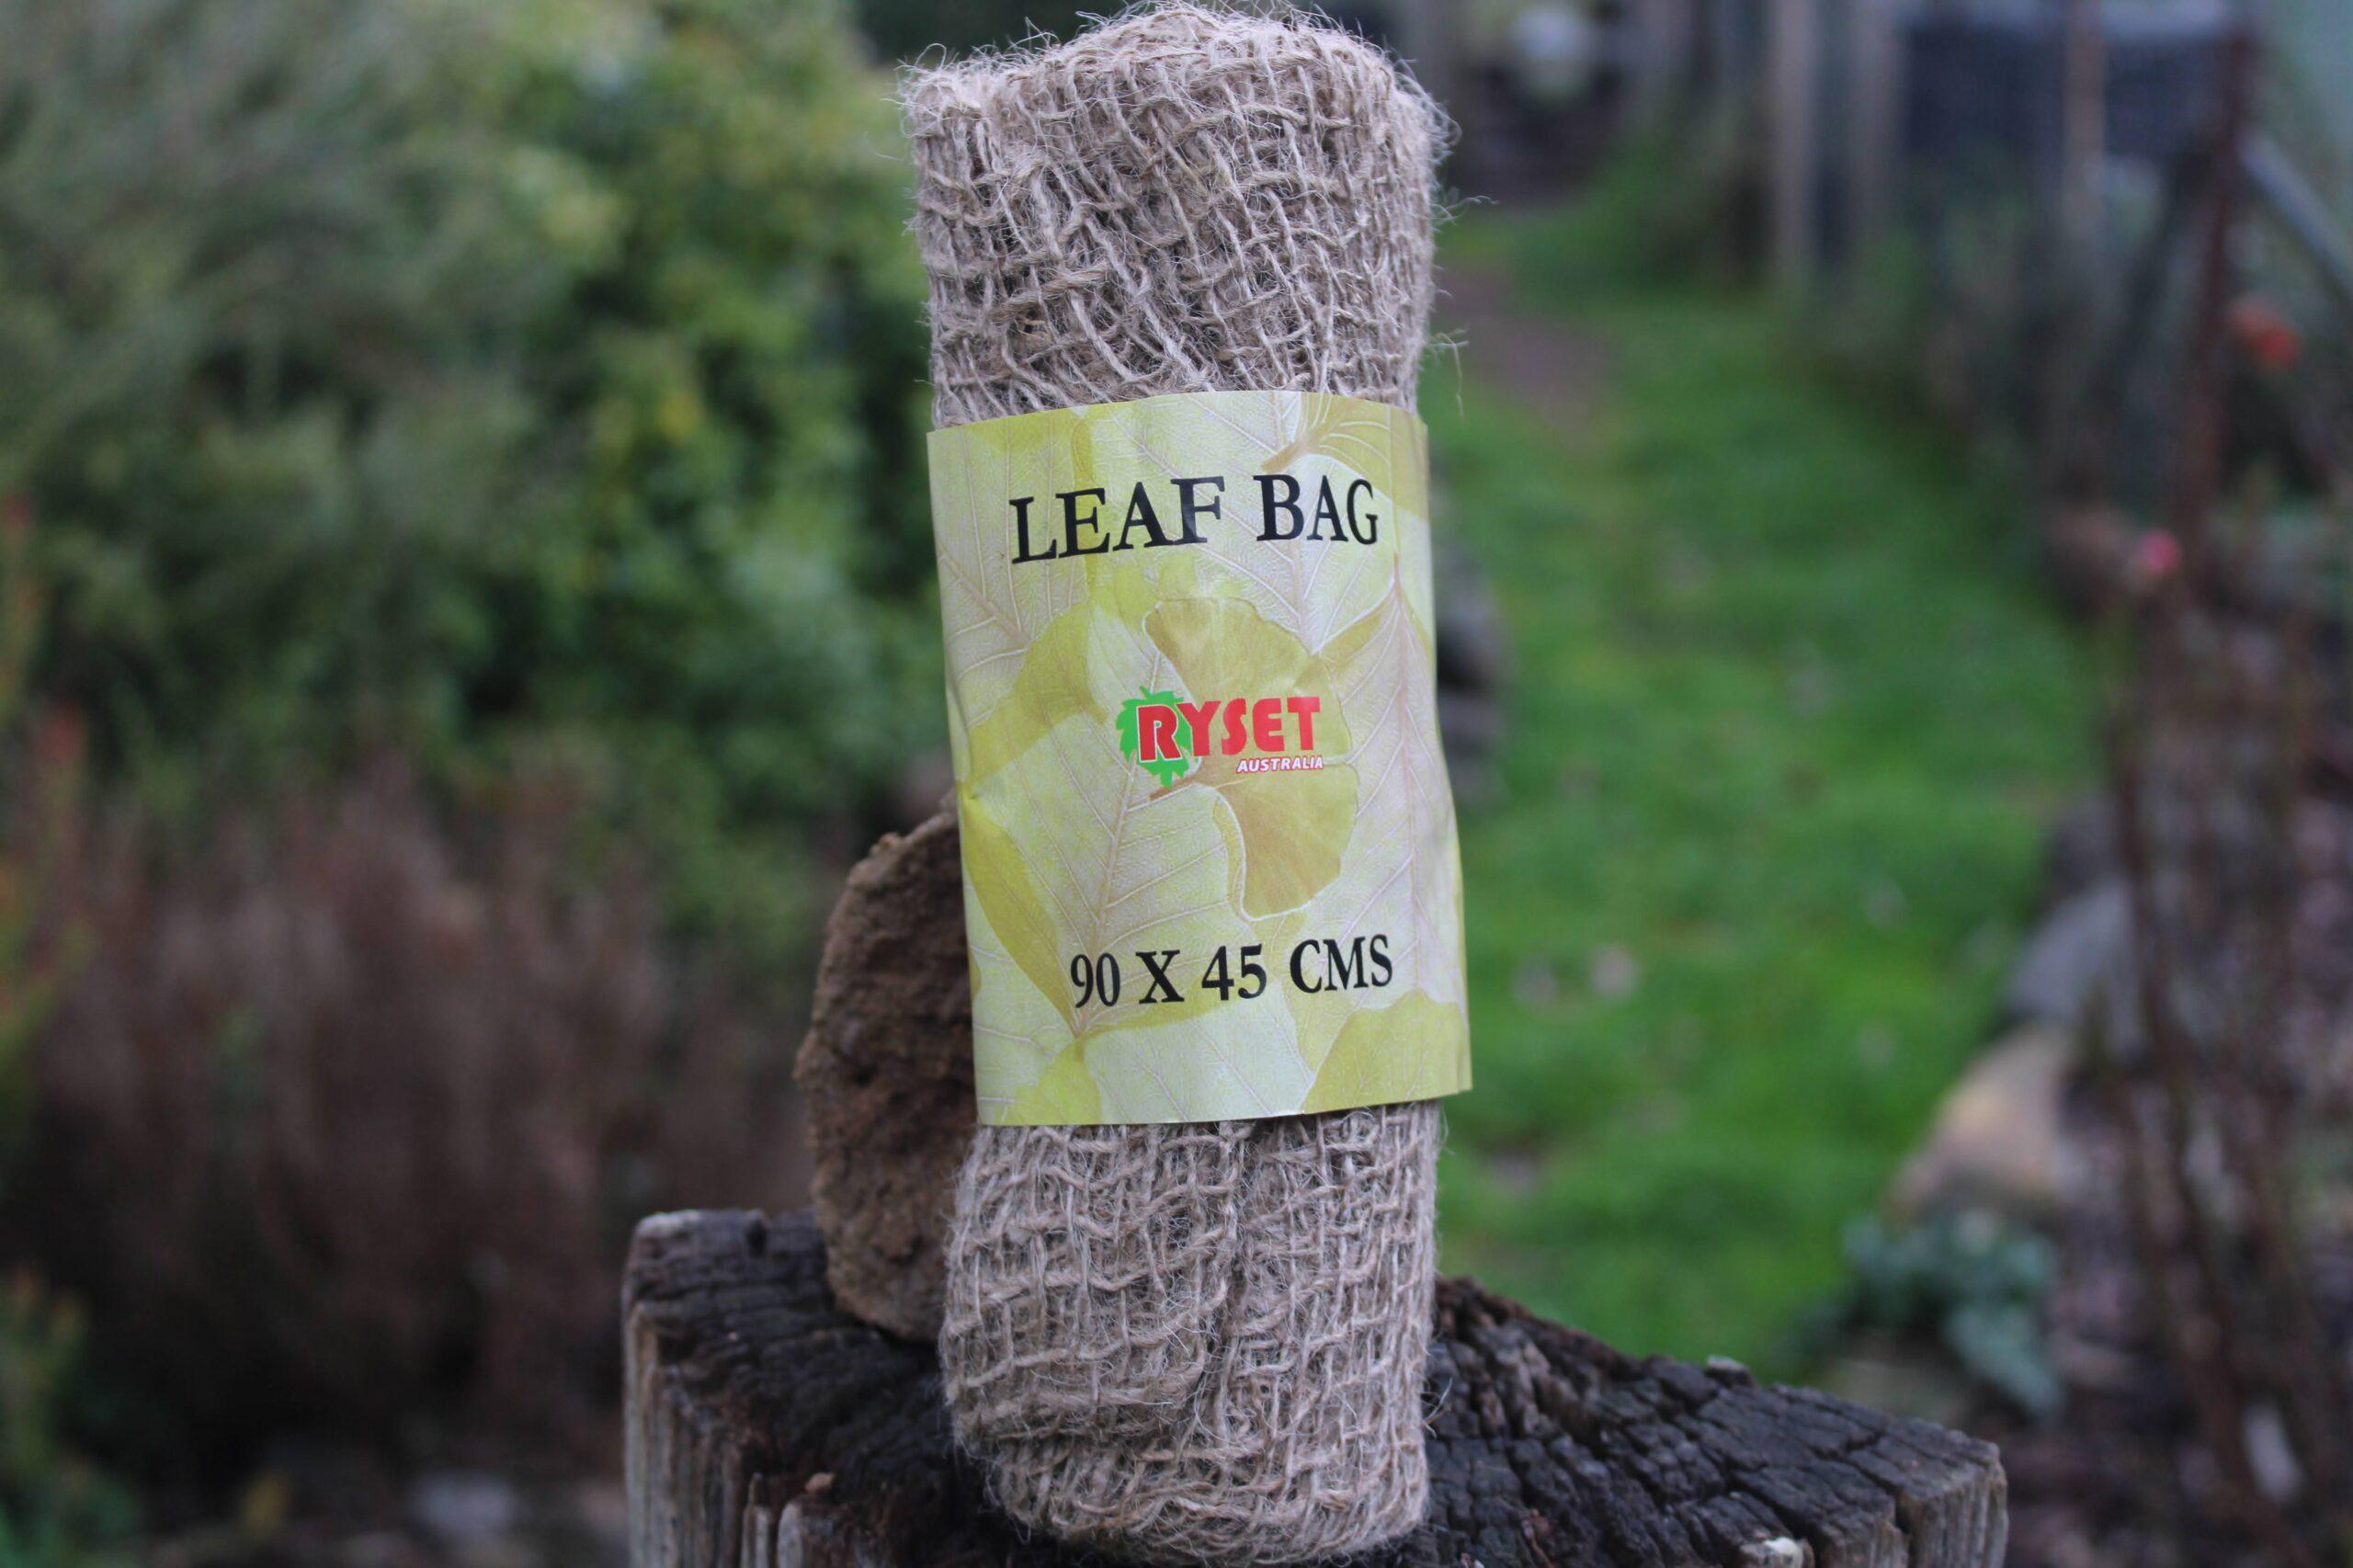 Leaf Bag displayed on a log